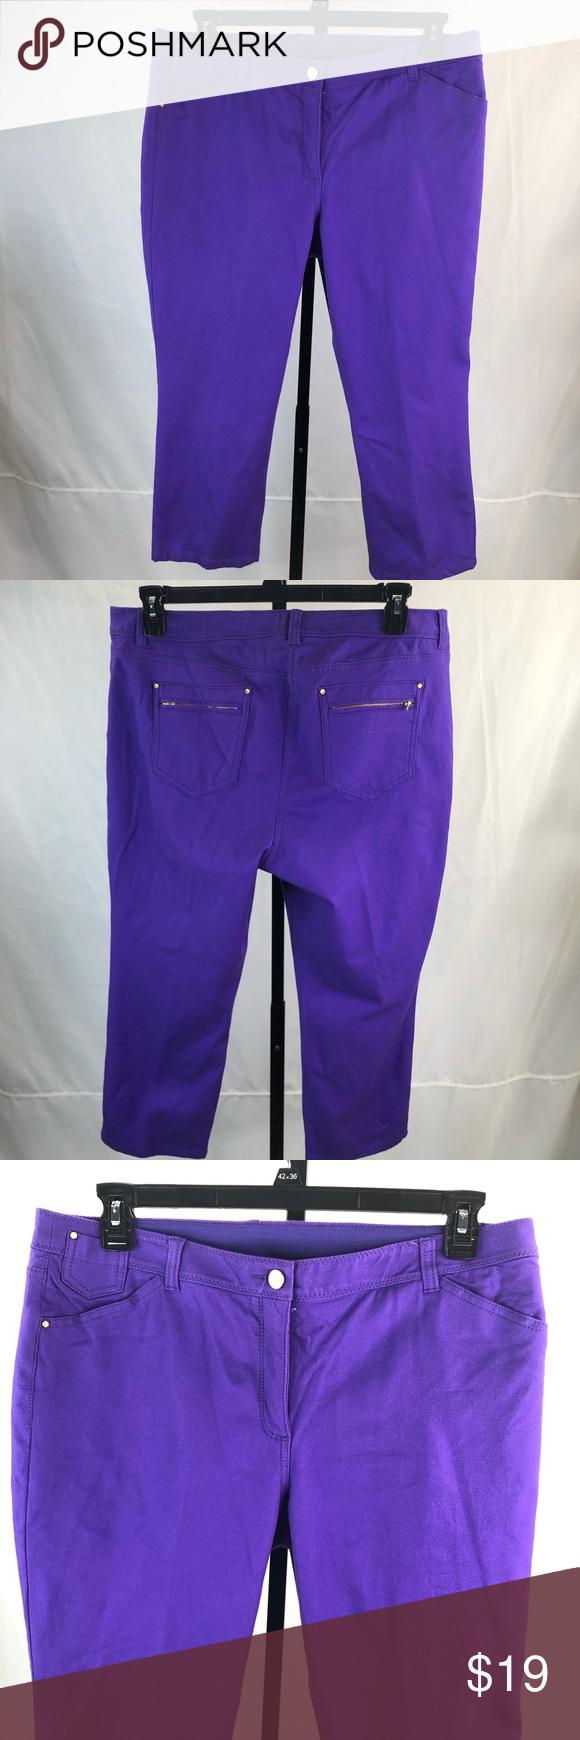 c2e75bda0e7b26 Chico's so slimming Capri pants size 2.5 Petite. Condition good. Jeans like  fabric , stretch, slimming Chico's Pants Capris